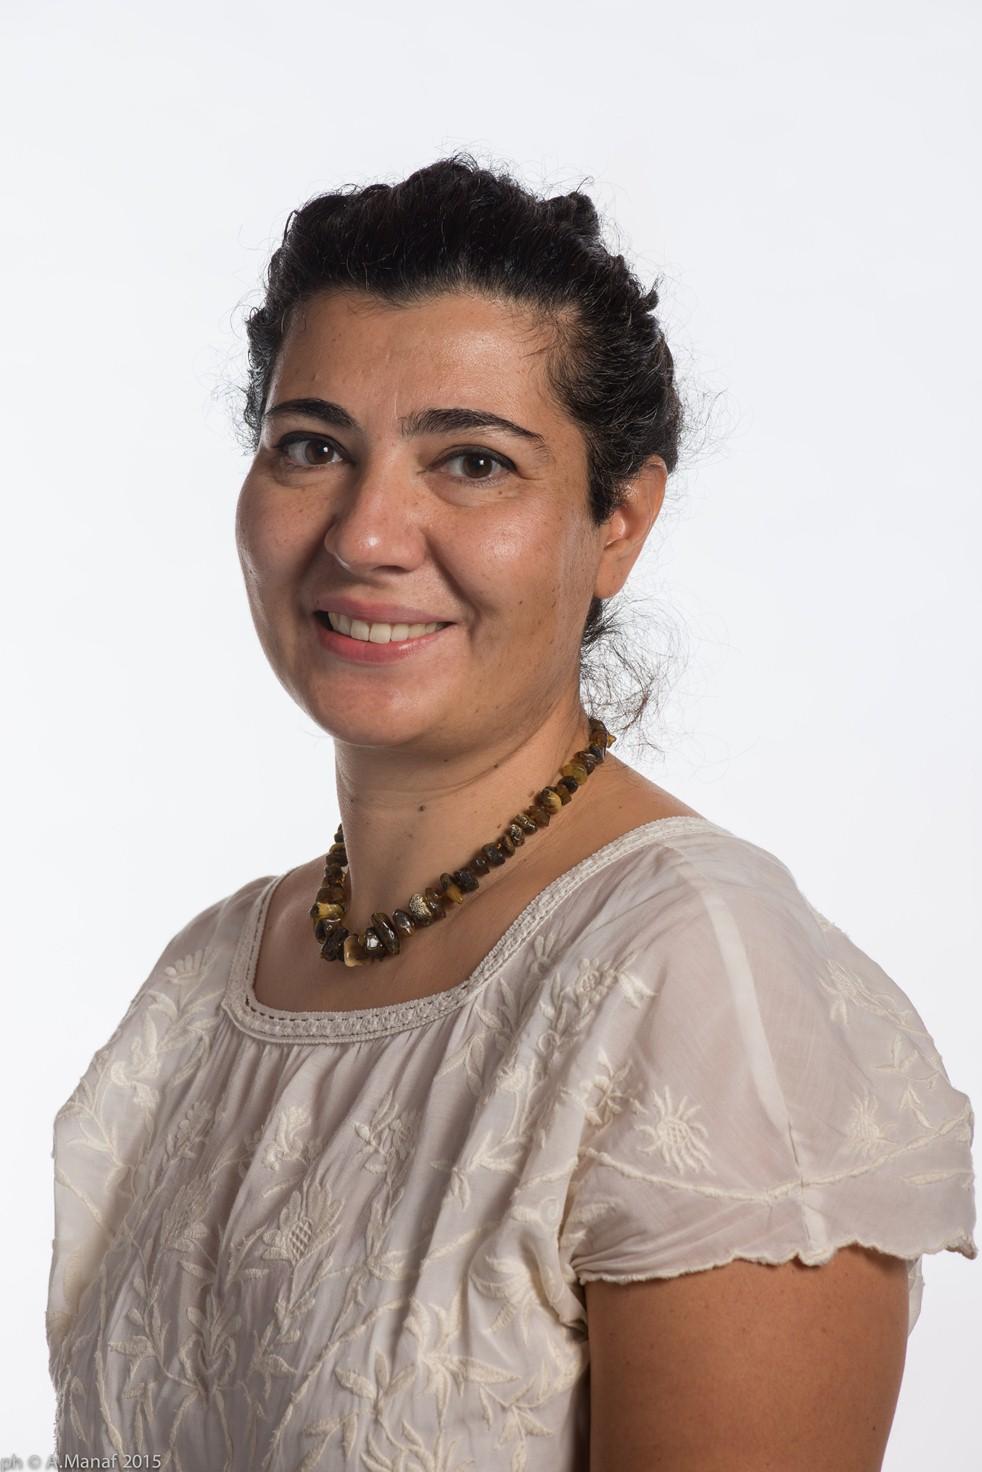 ph Altin Manaf